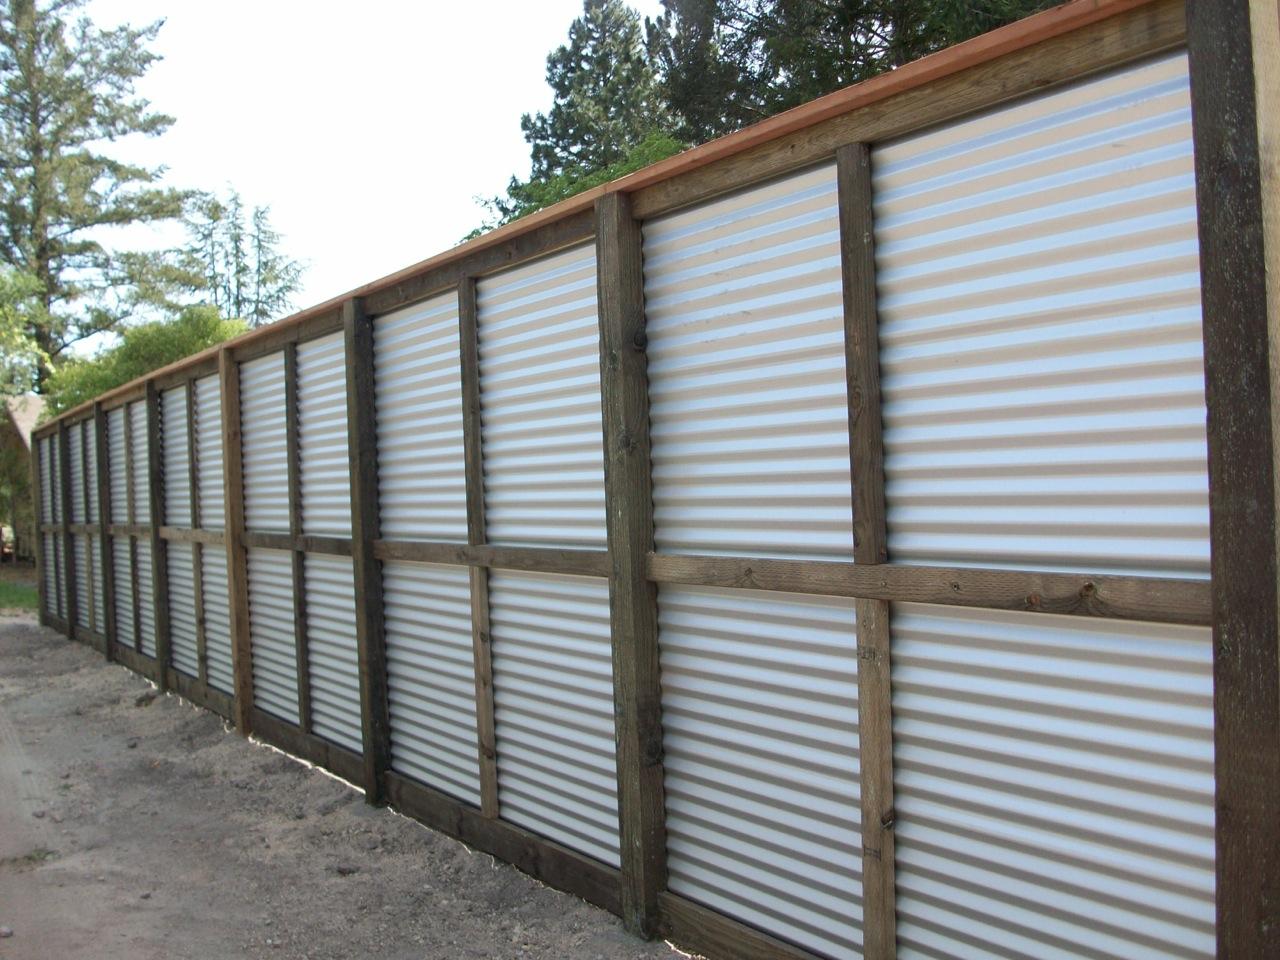 Wood with galvanized tin « arbor fence inc a diamond